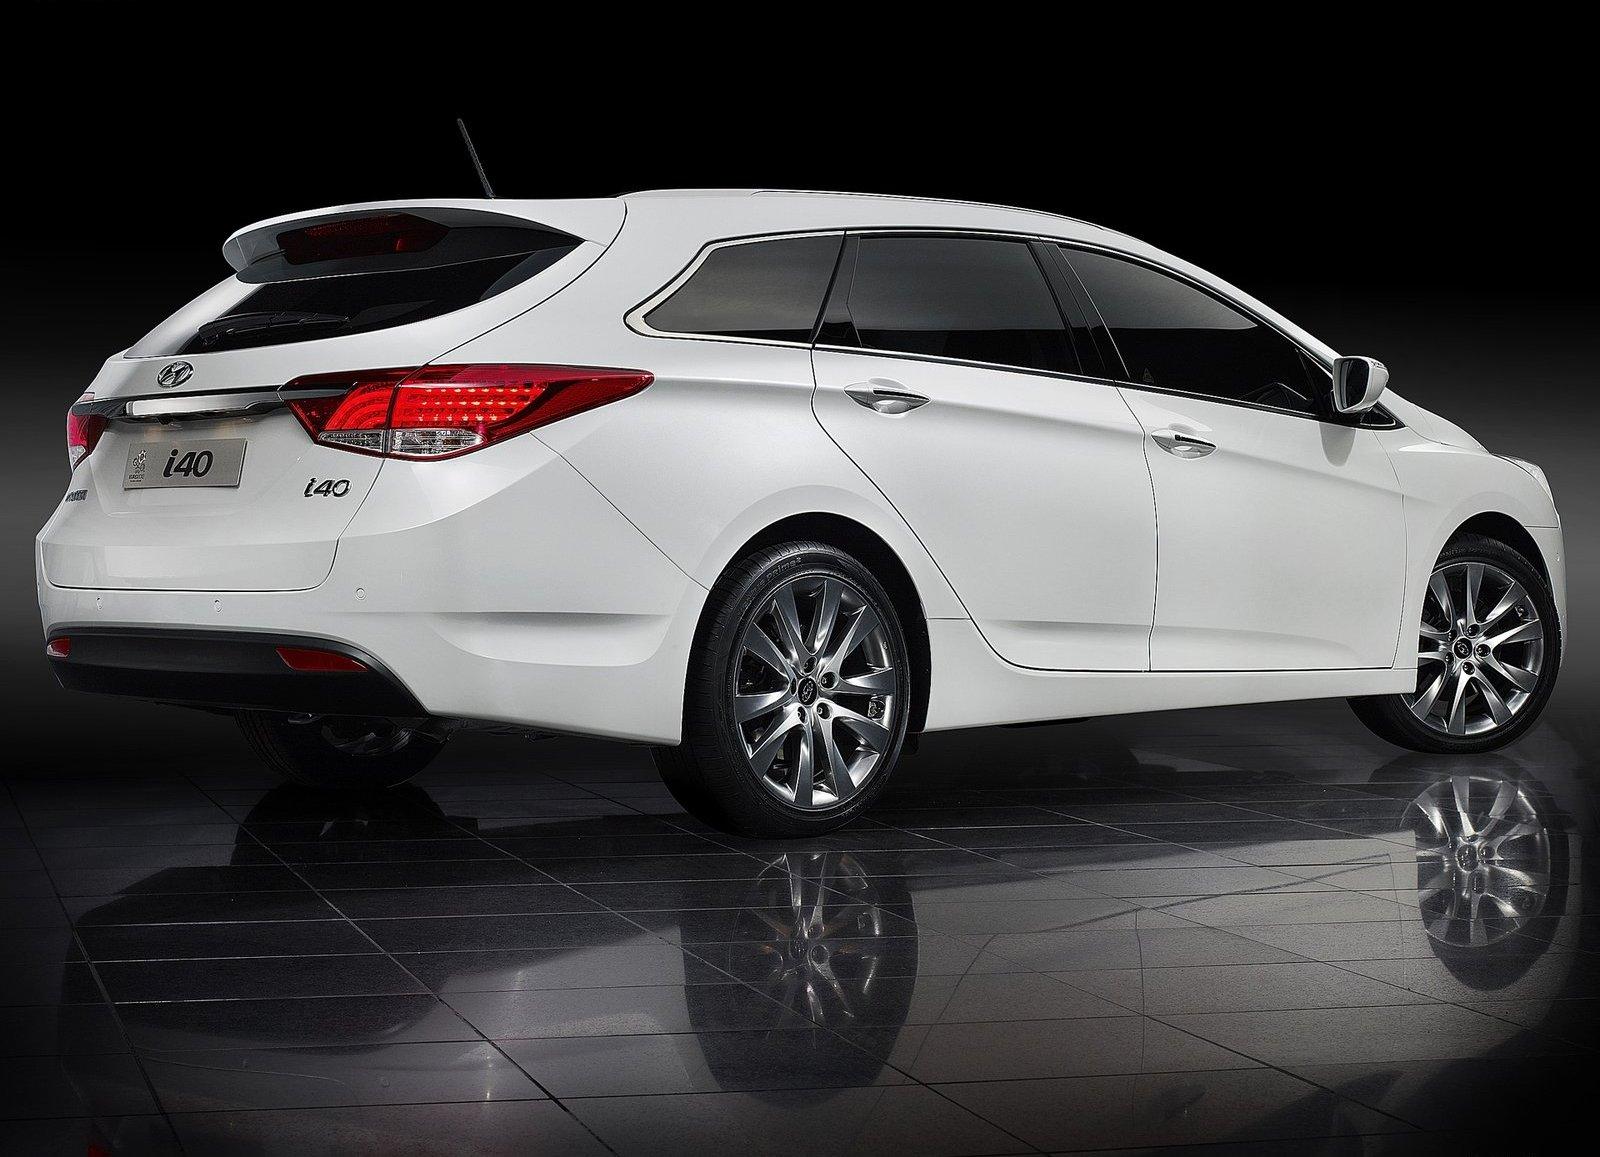 http://3.bp.blogspot.com/-0w_41--Ncus/ToQsvxHFG-I/AAAAAAAABGs/N79wKue7nuE/s1600/Hyundai-i40_Wagon_2012_1600x1200_wallpaper_45.jpg